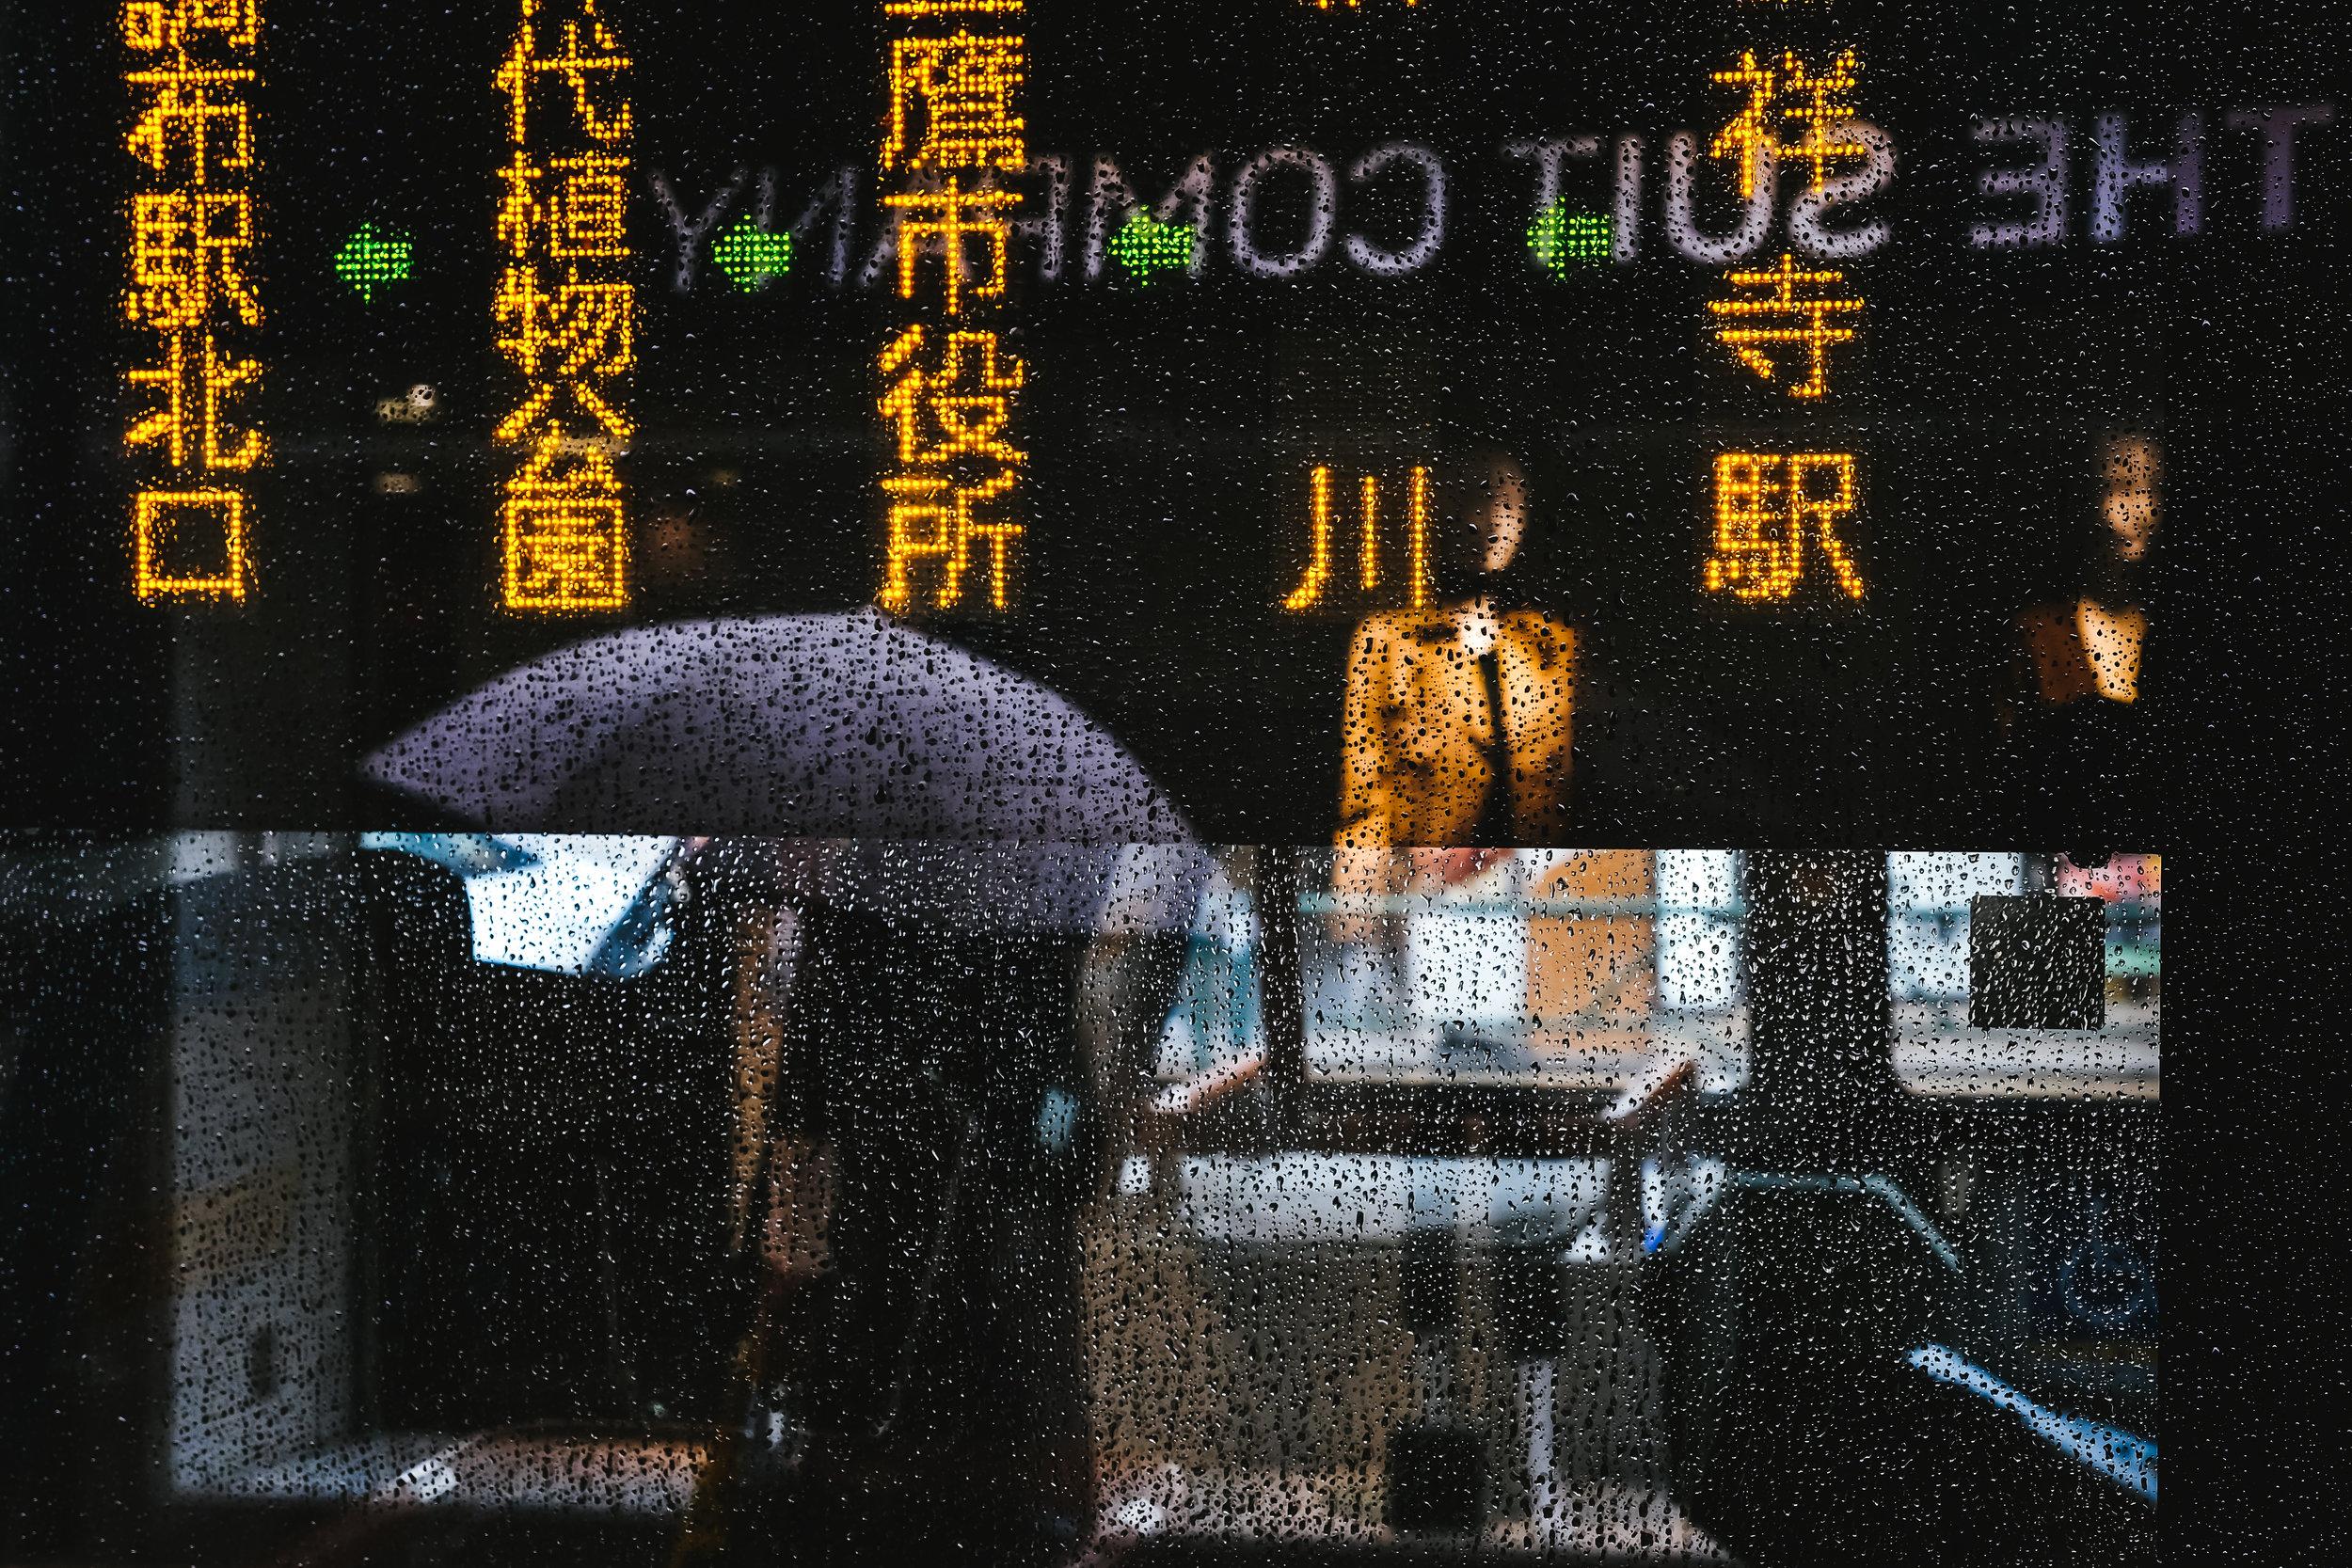 bus-rain-reflection-1.jpg